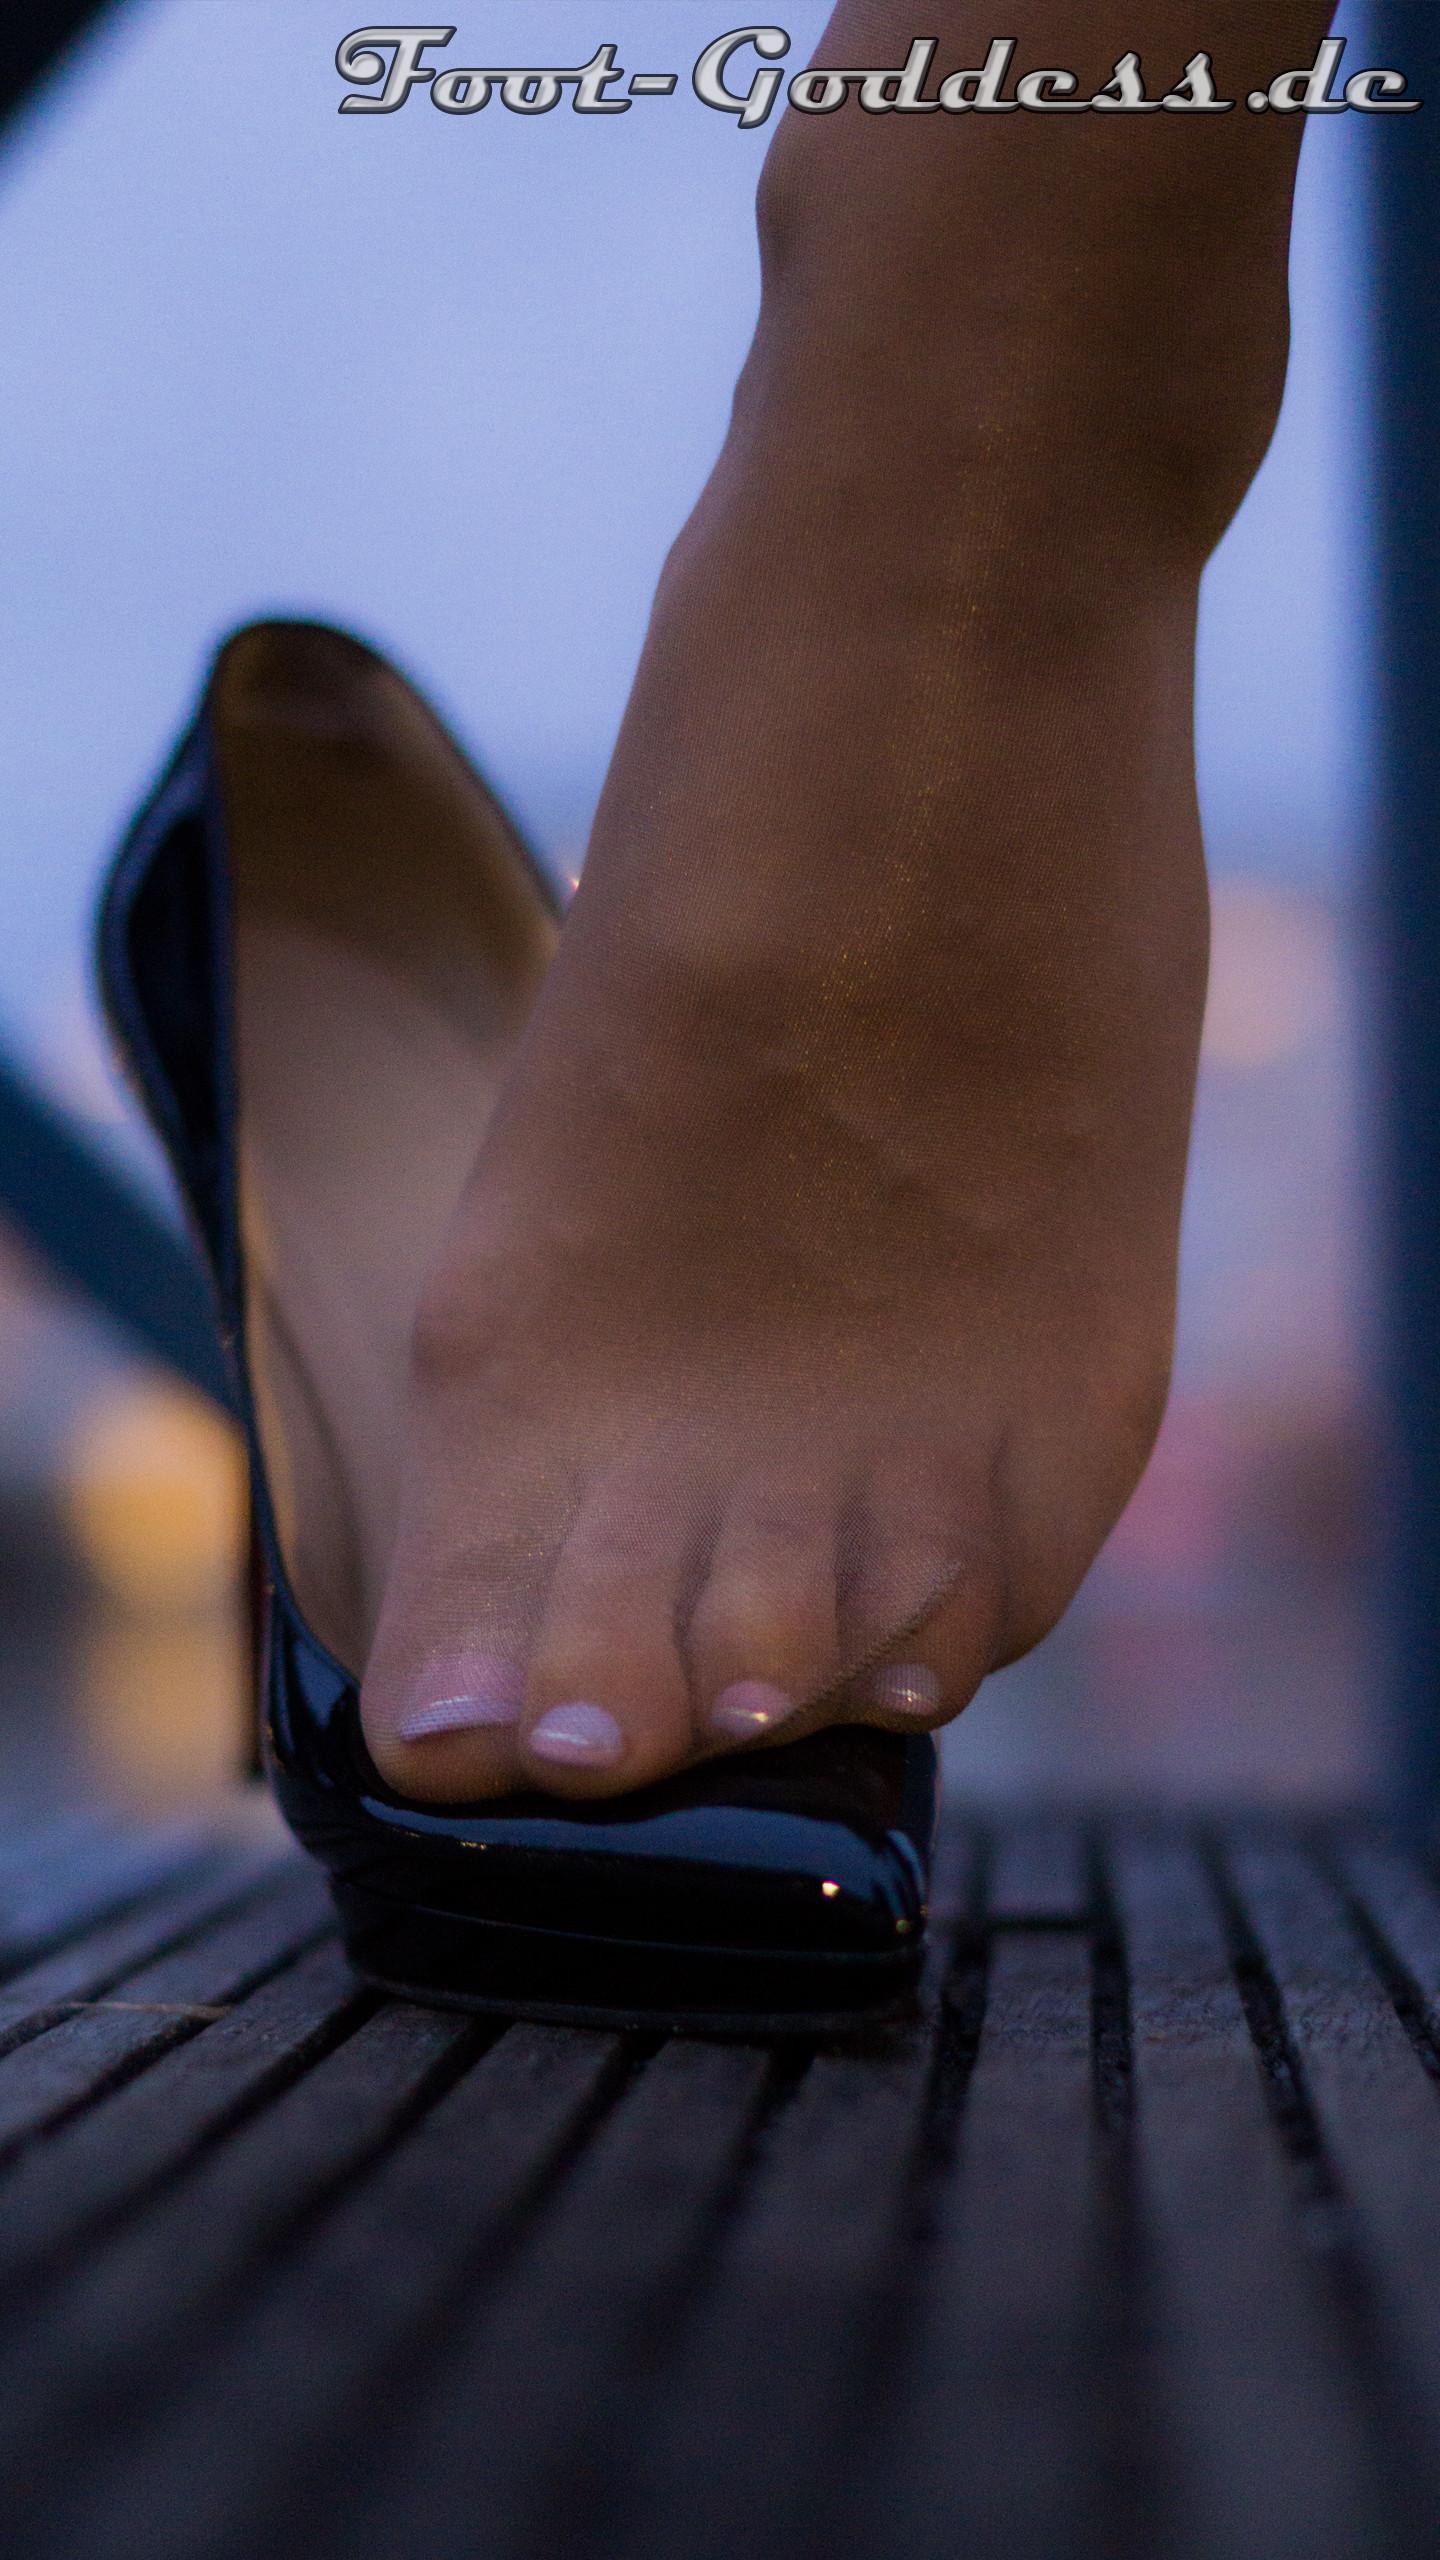 foot-goddess-1-6